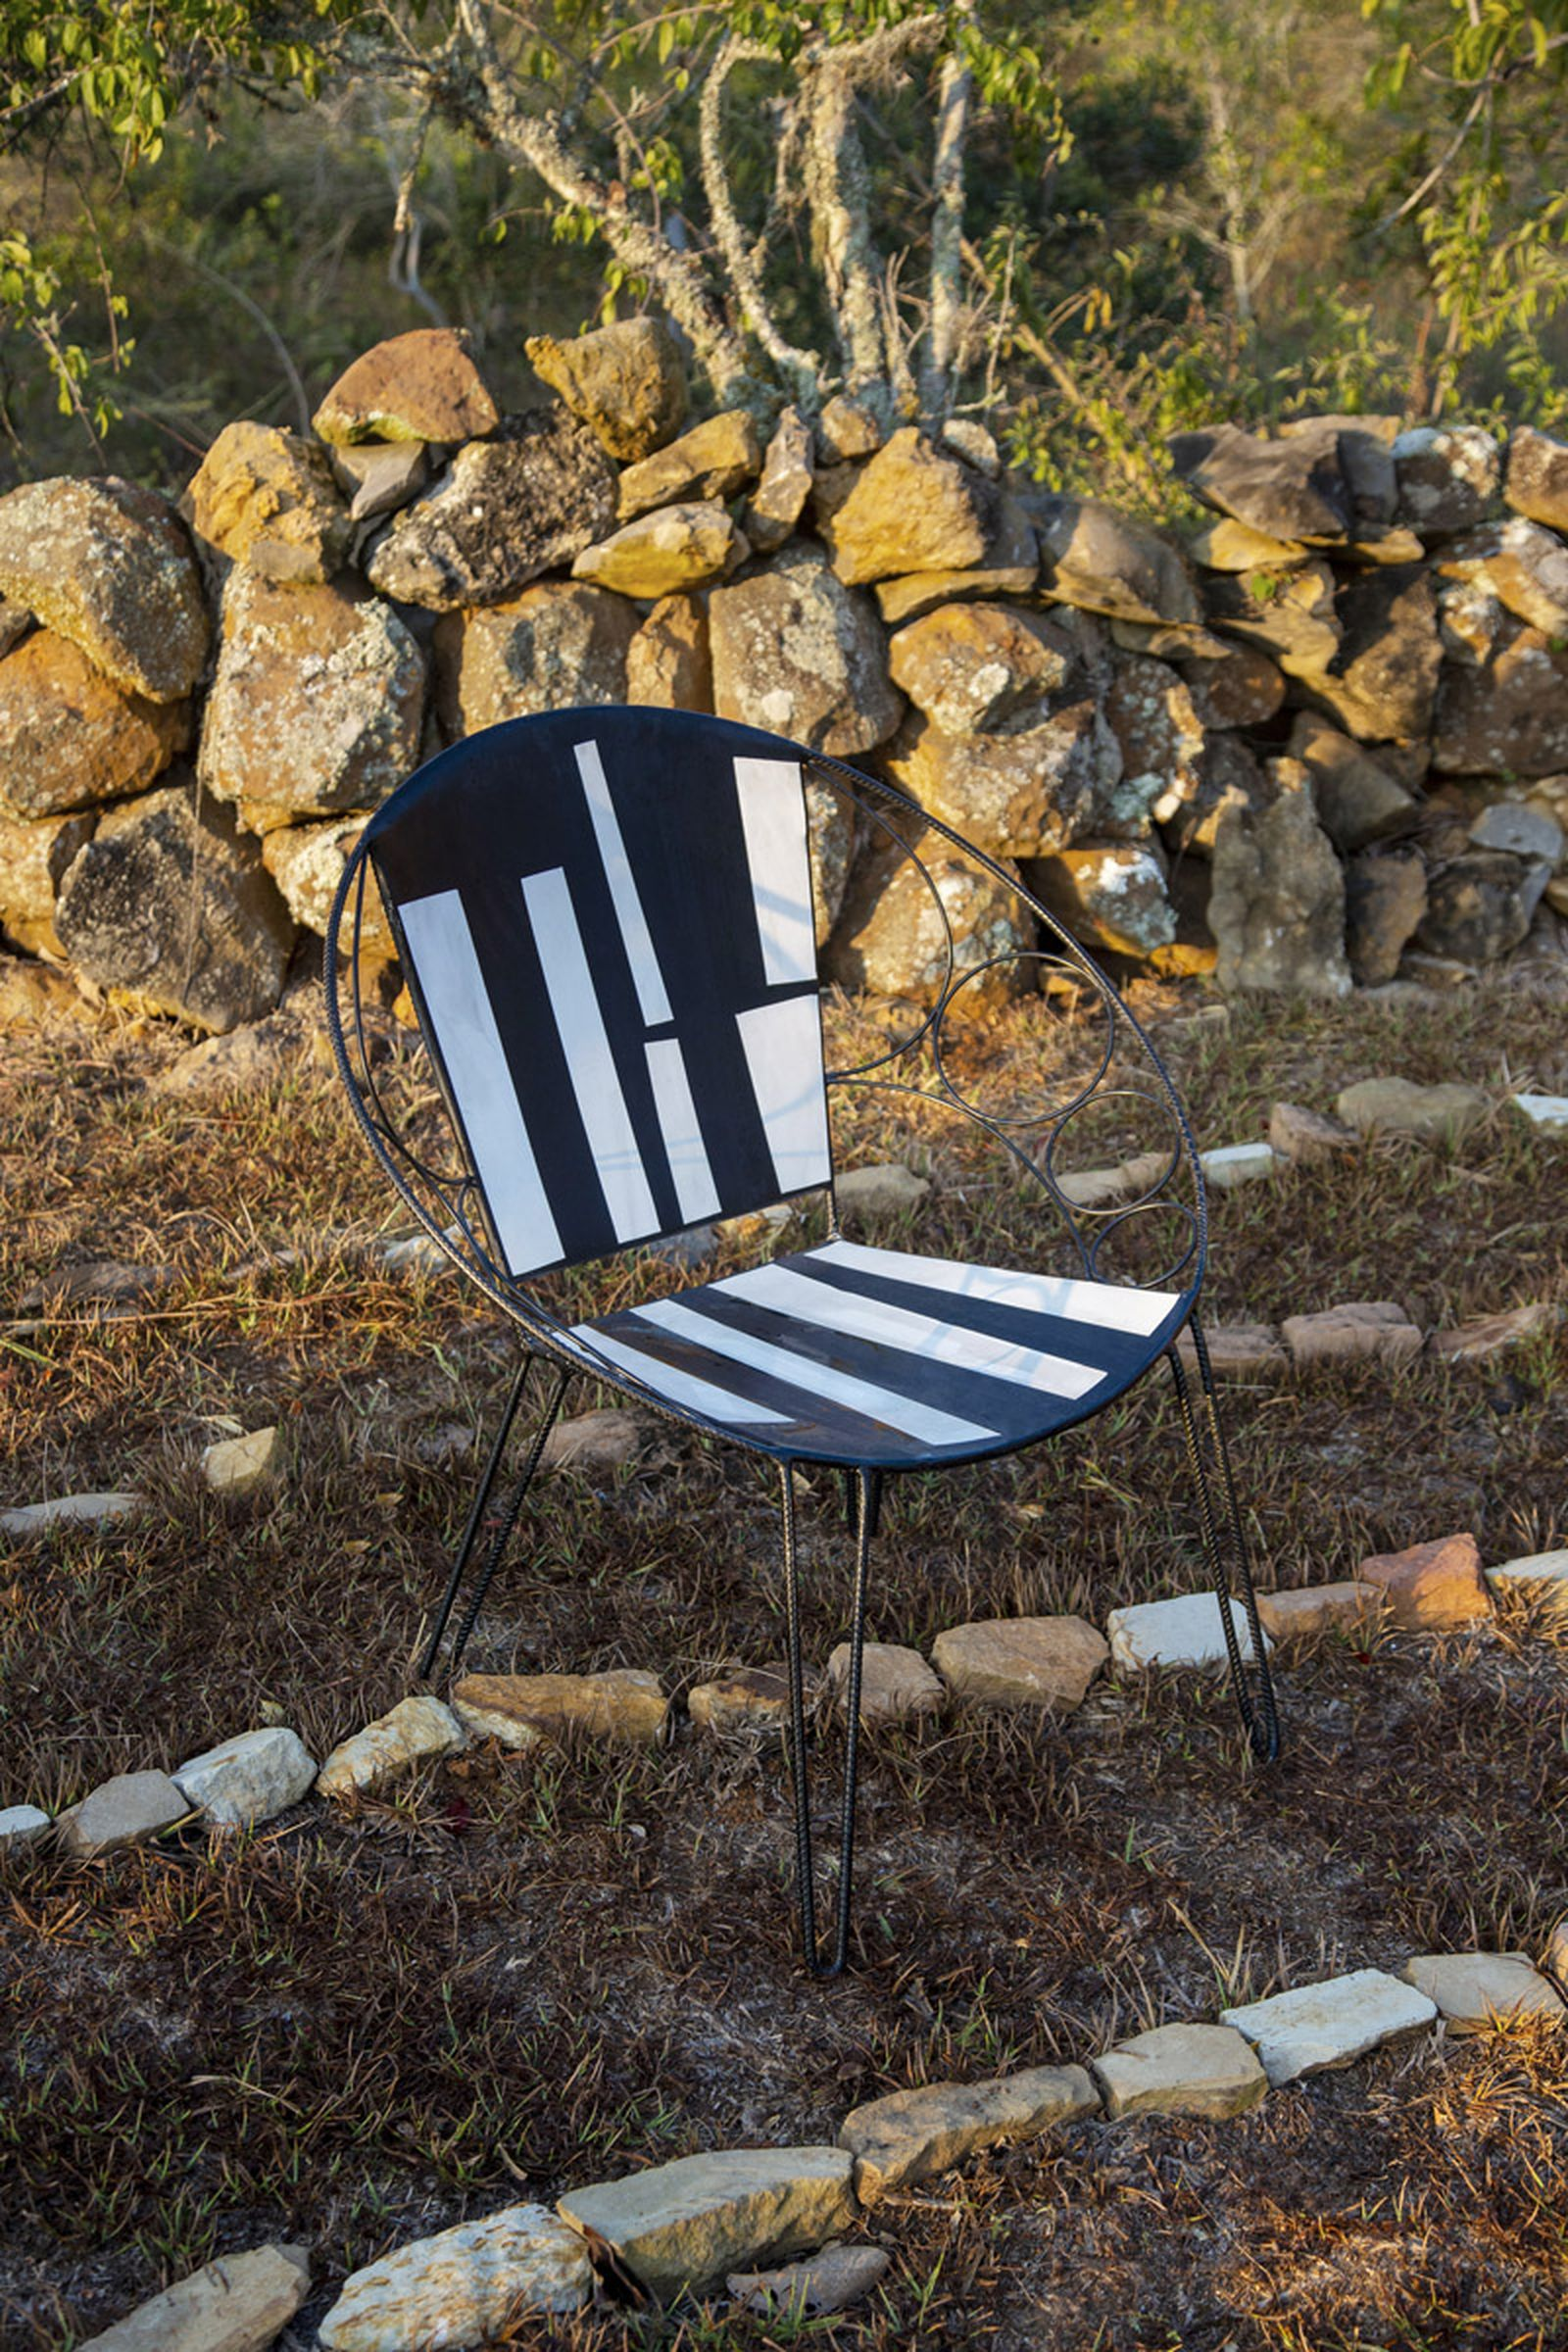 Images of Marni's new furniture range